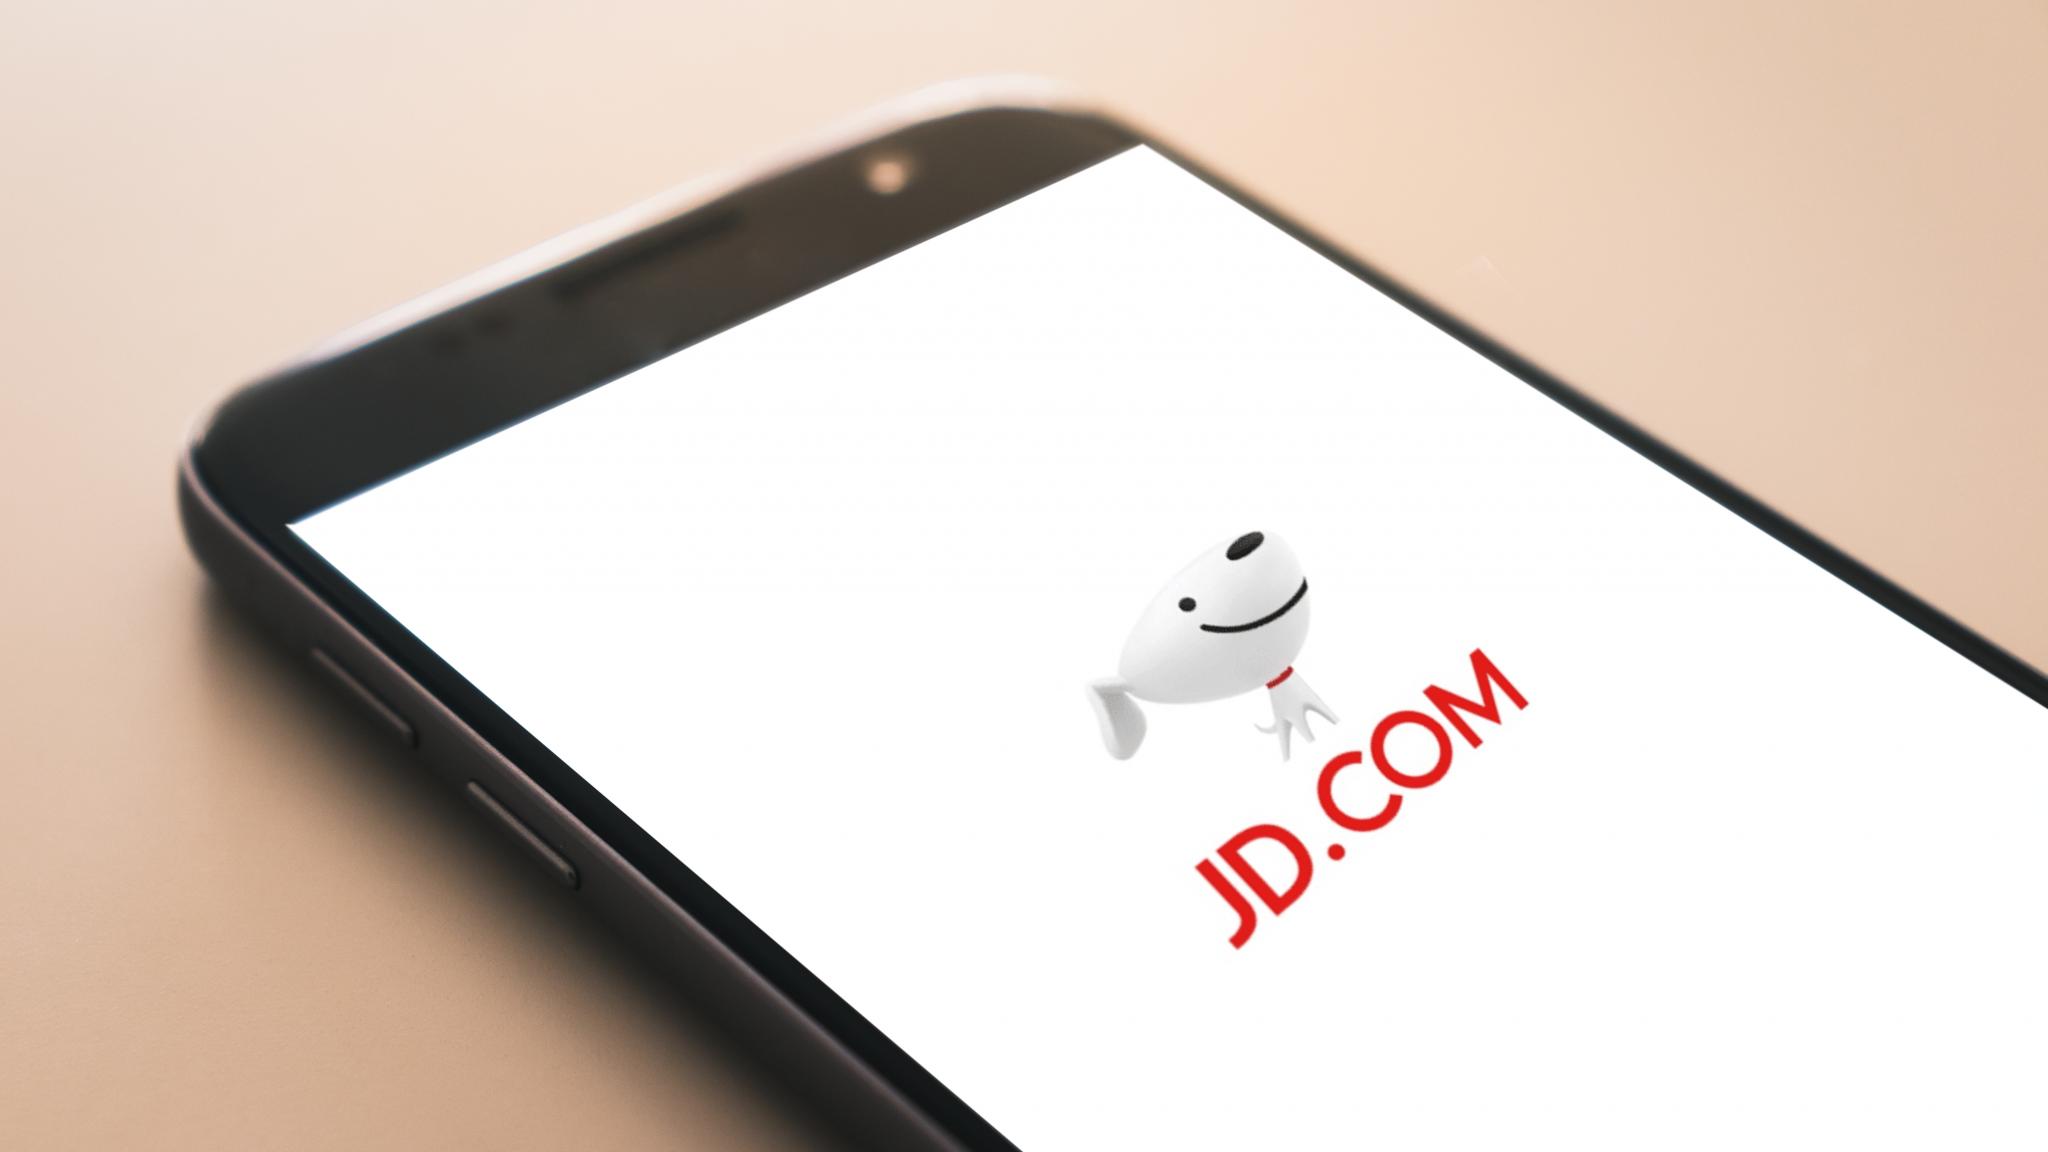 counterpoint jd.com news